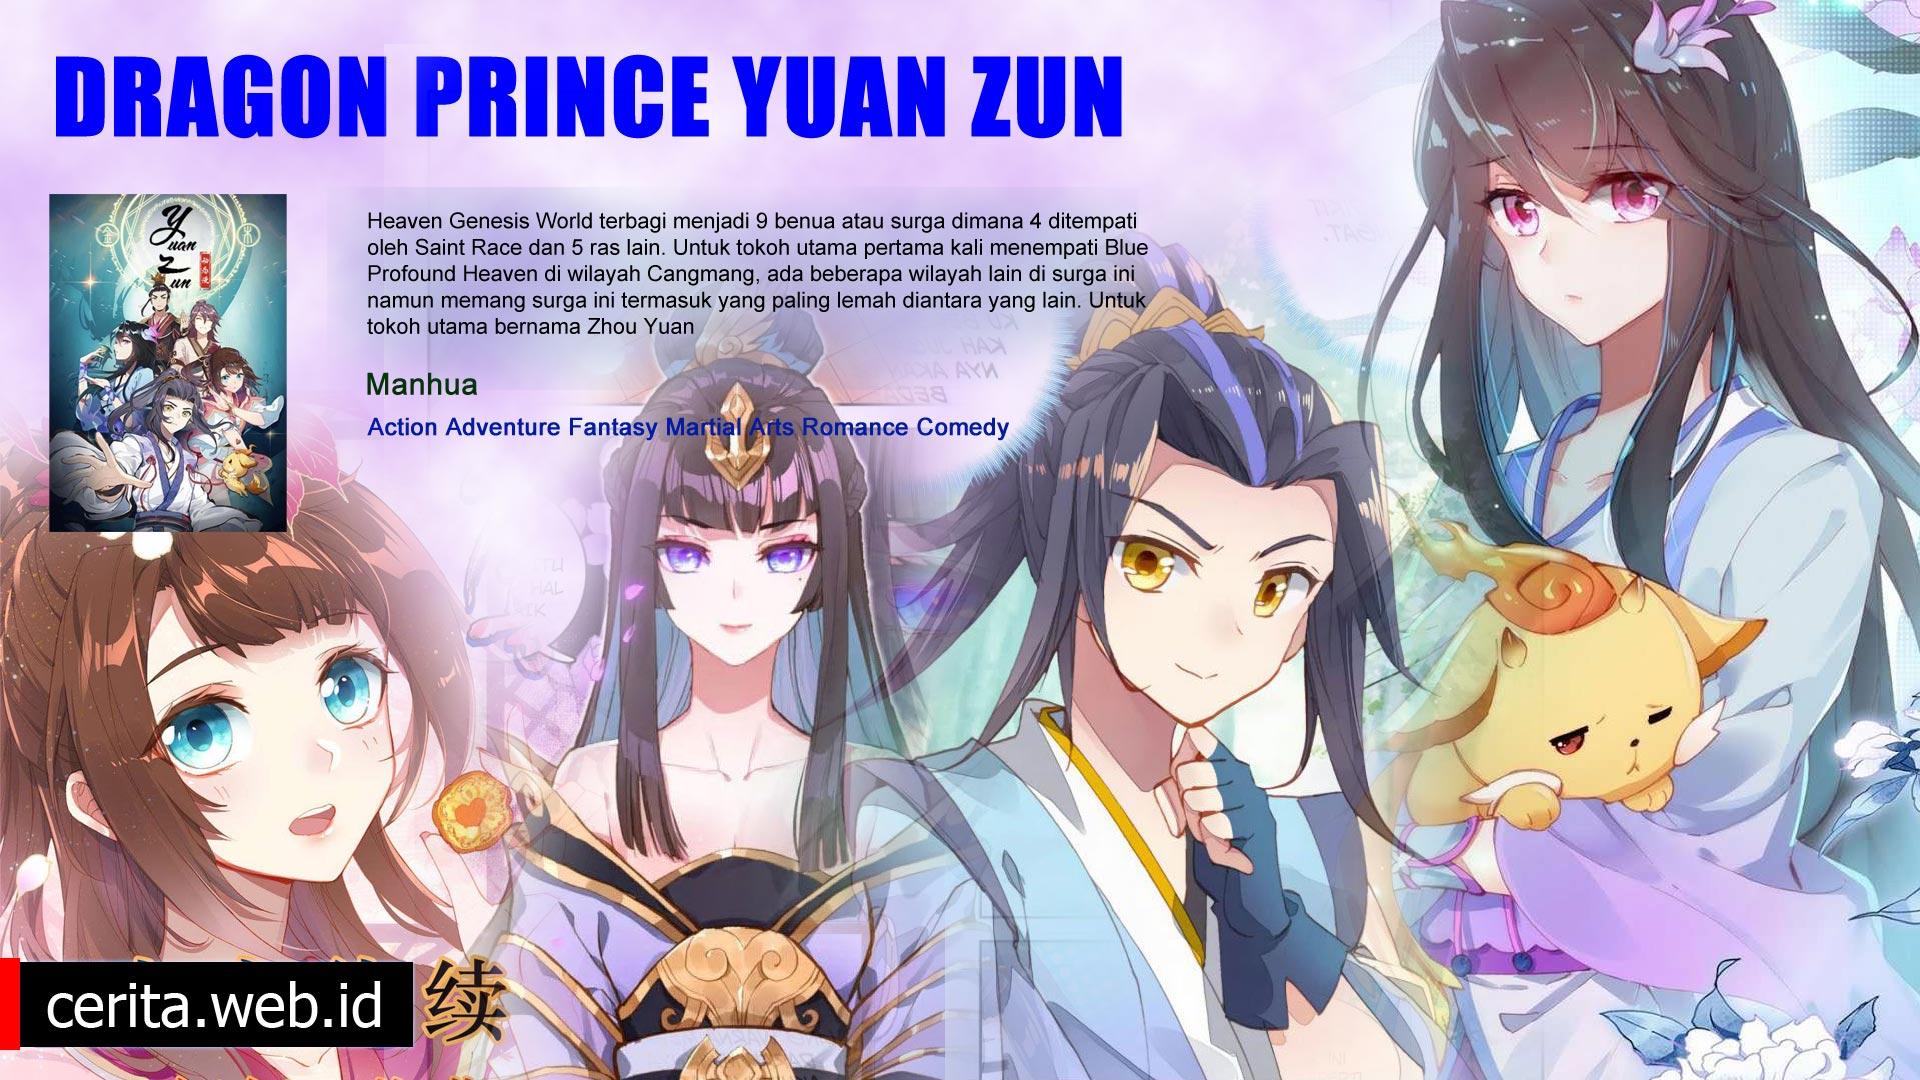 Sinopsis Dragon Prince Yuan Zun Novel Komik MC Lemah Menjadi Kuat